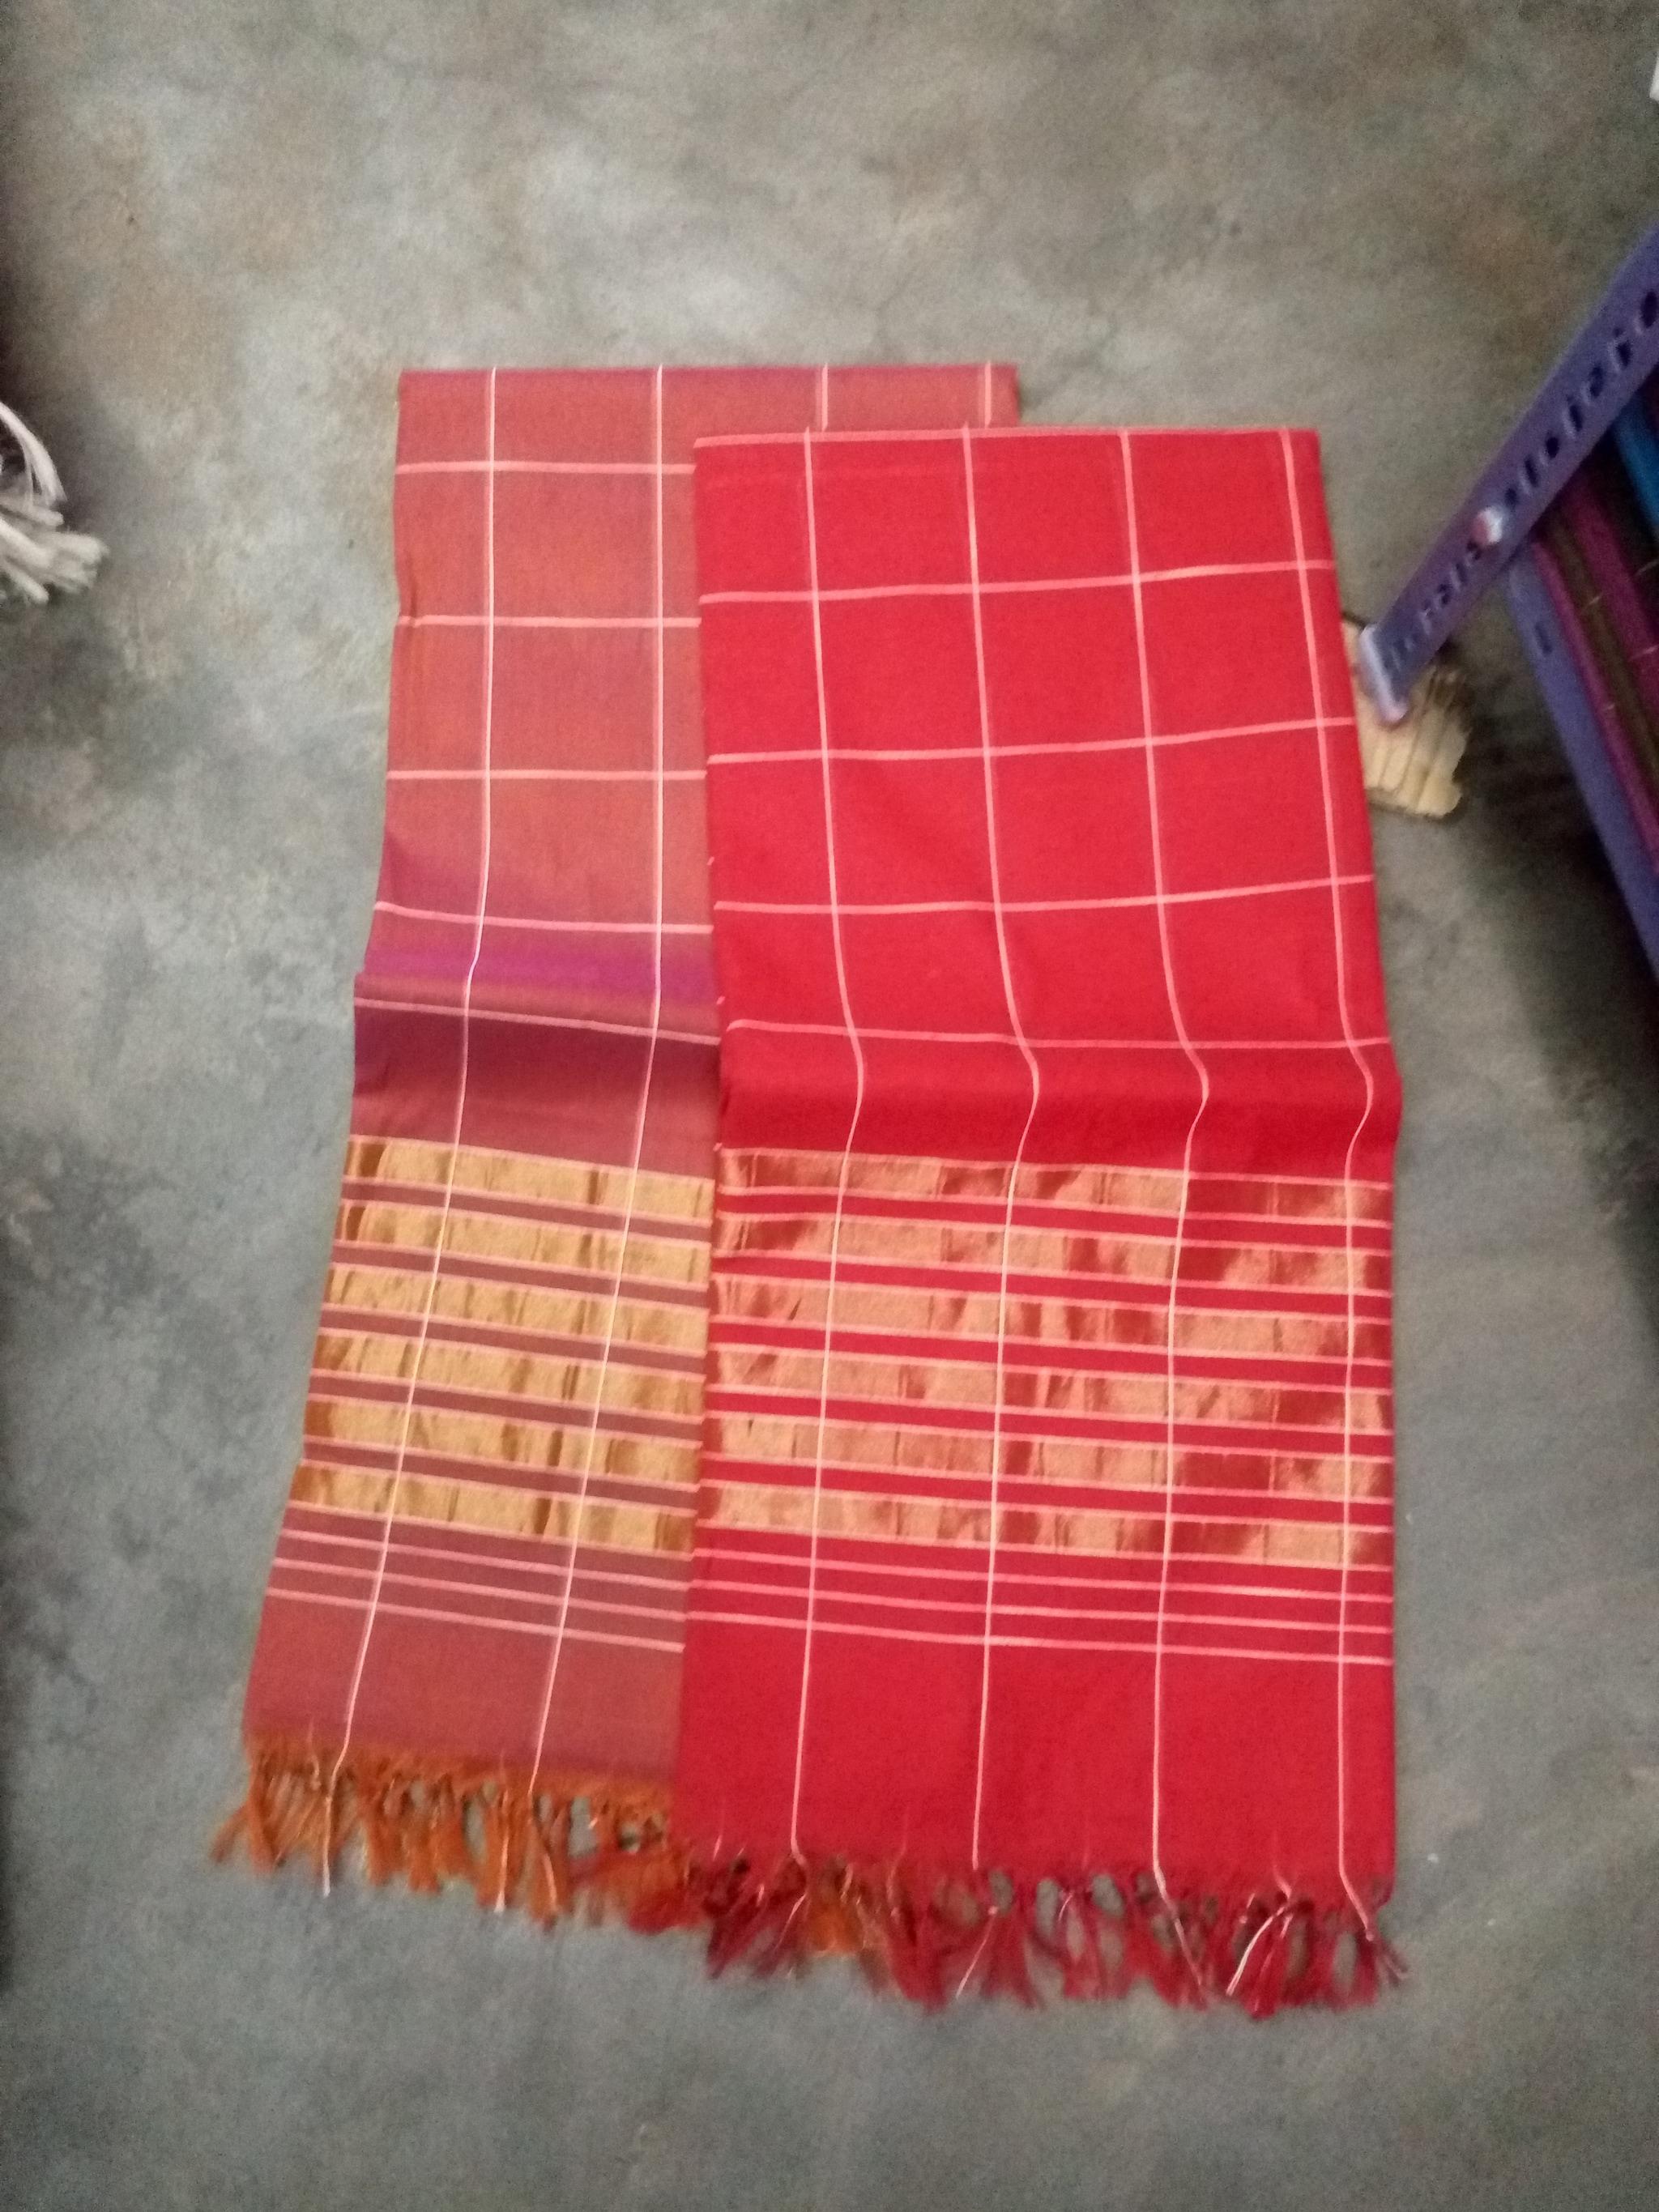 Top 10 Soft Silk Saree Wholesalers in Coimbatore - Justdial